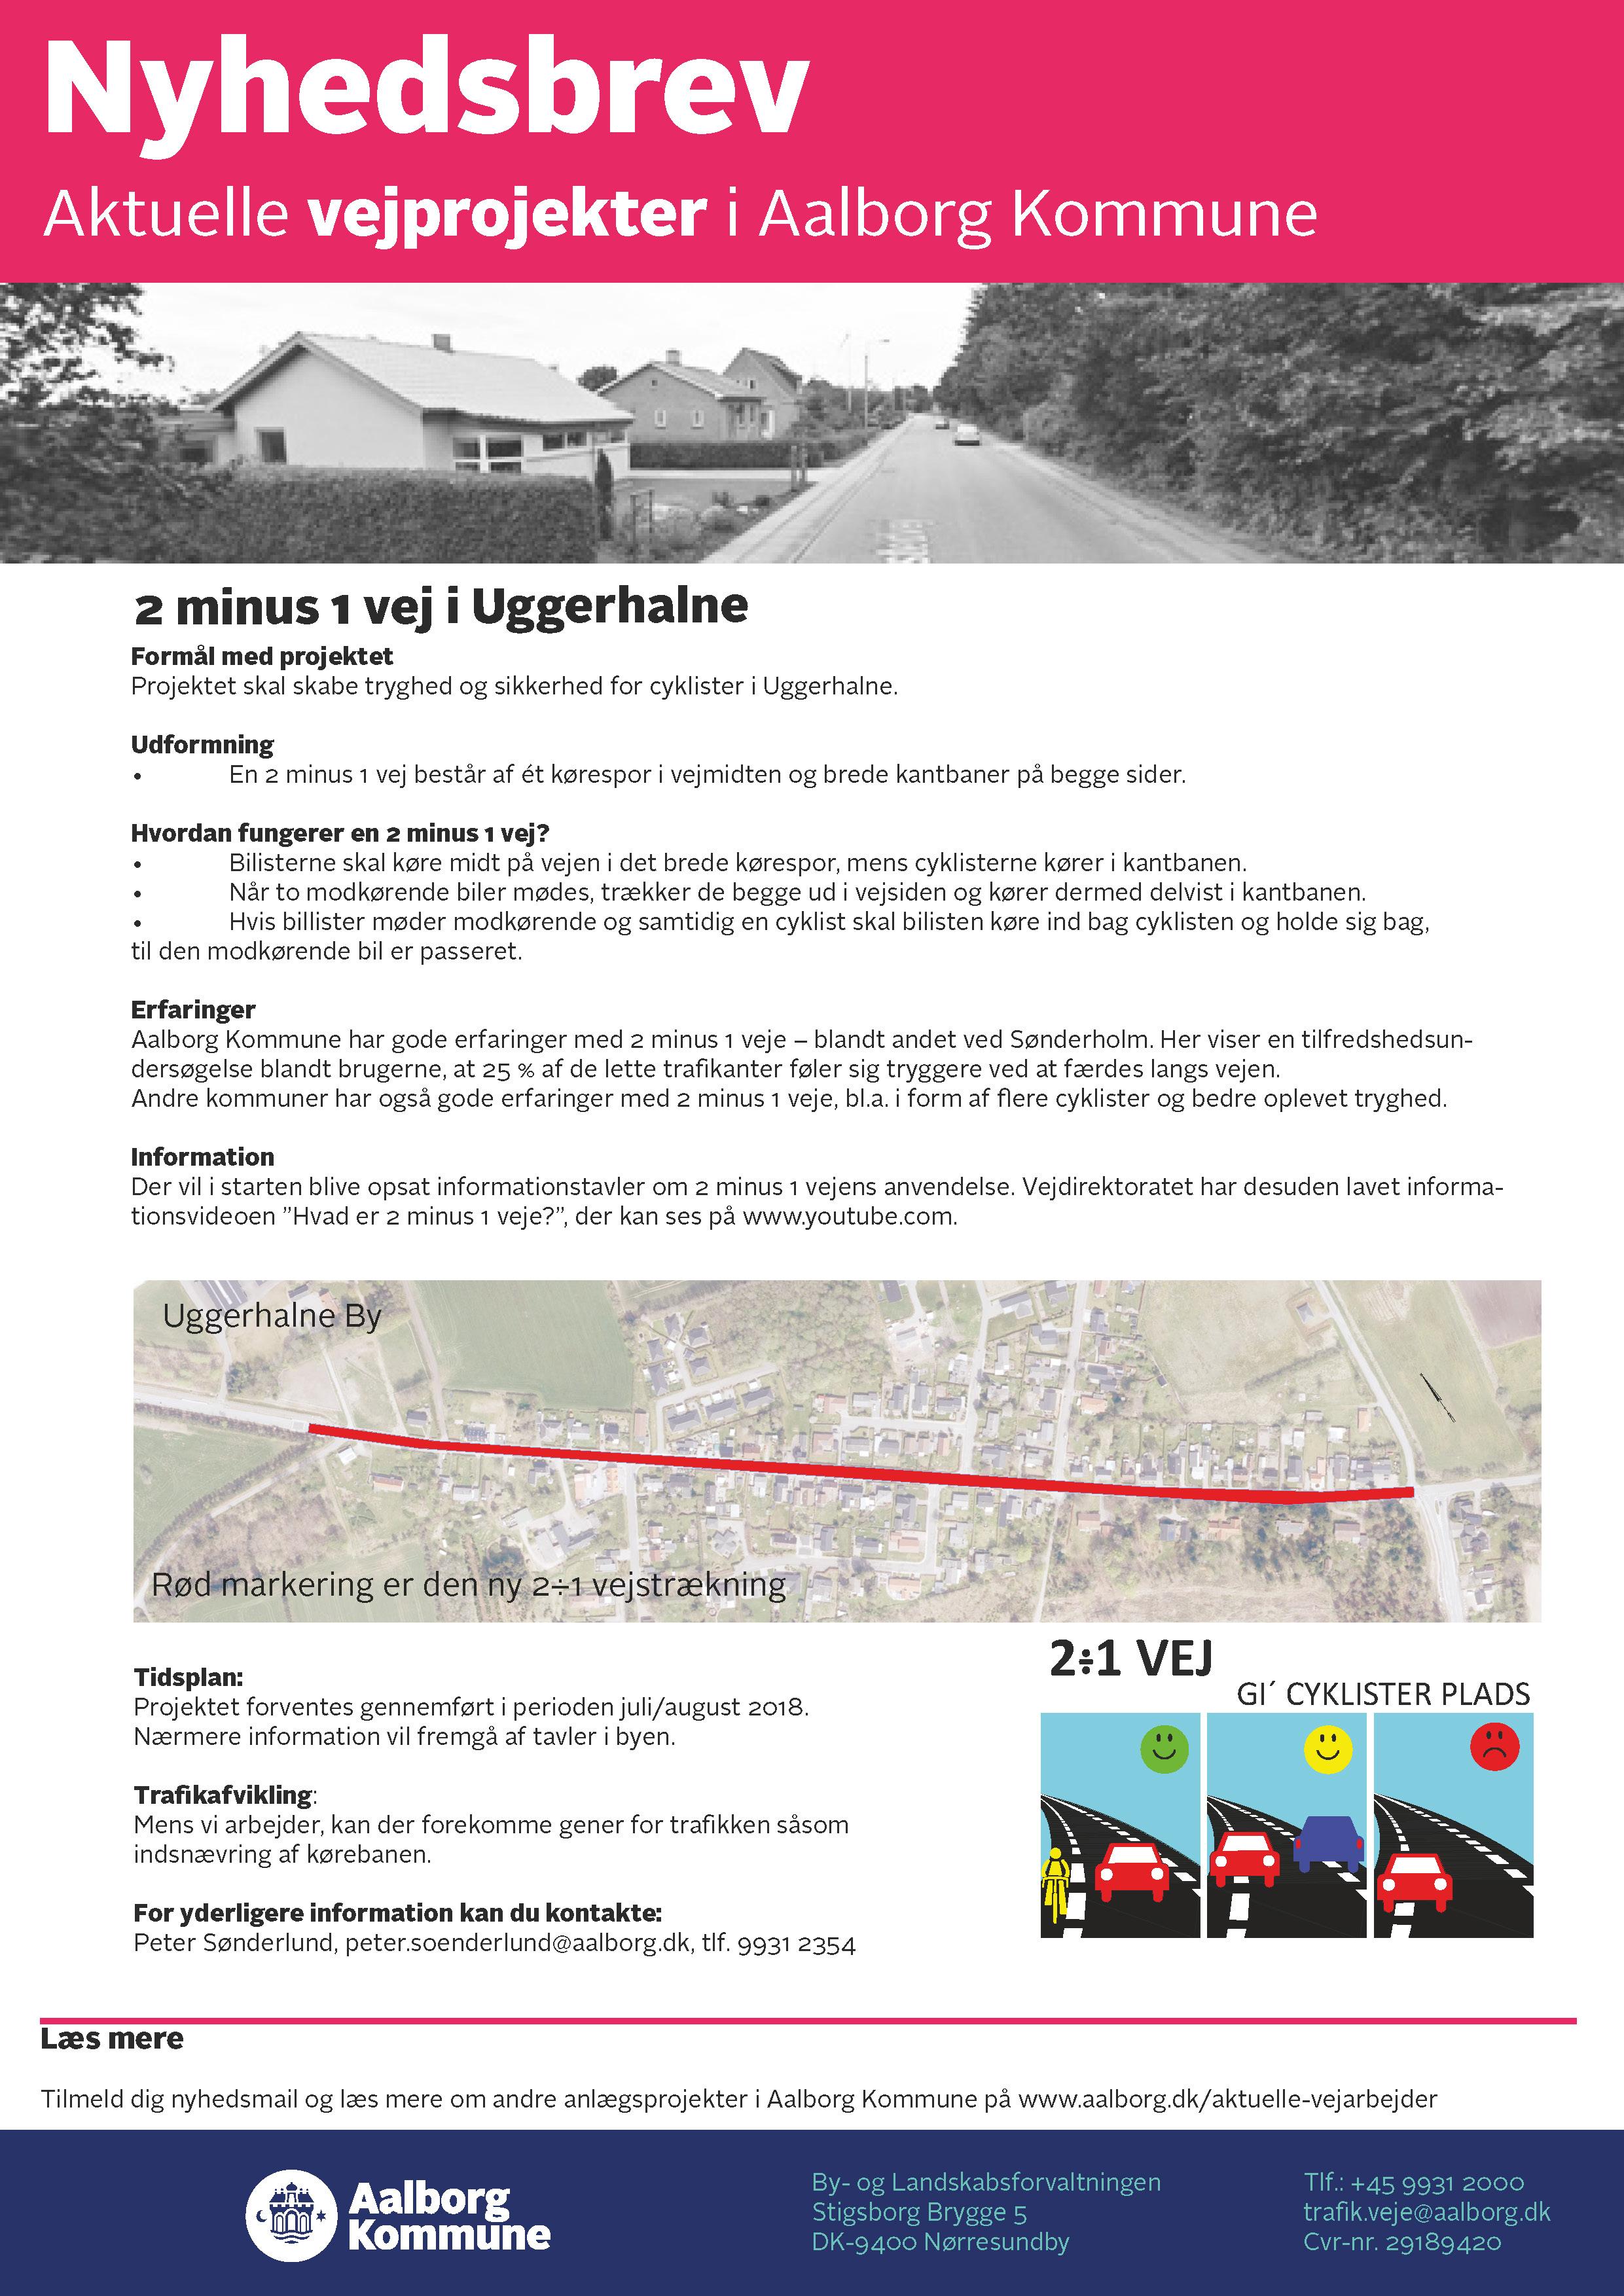 Nyhedsmail Uggerhalme 2 minus 1 vej (05-07-2018-2)